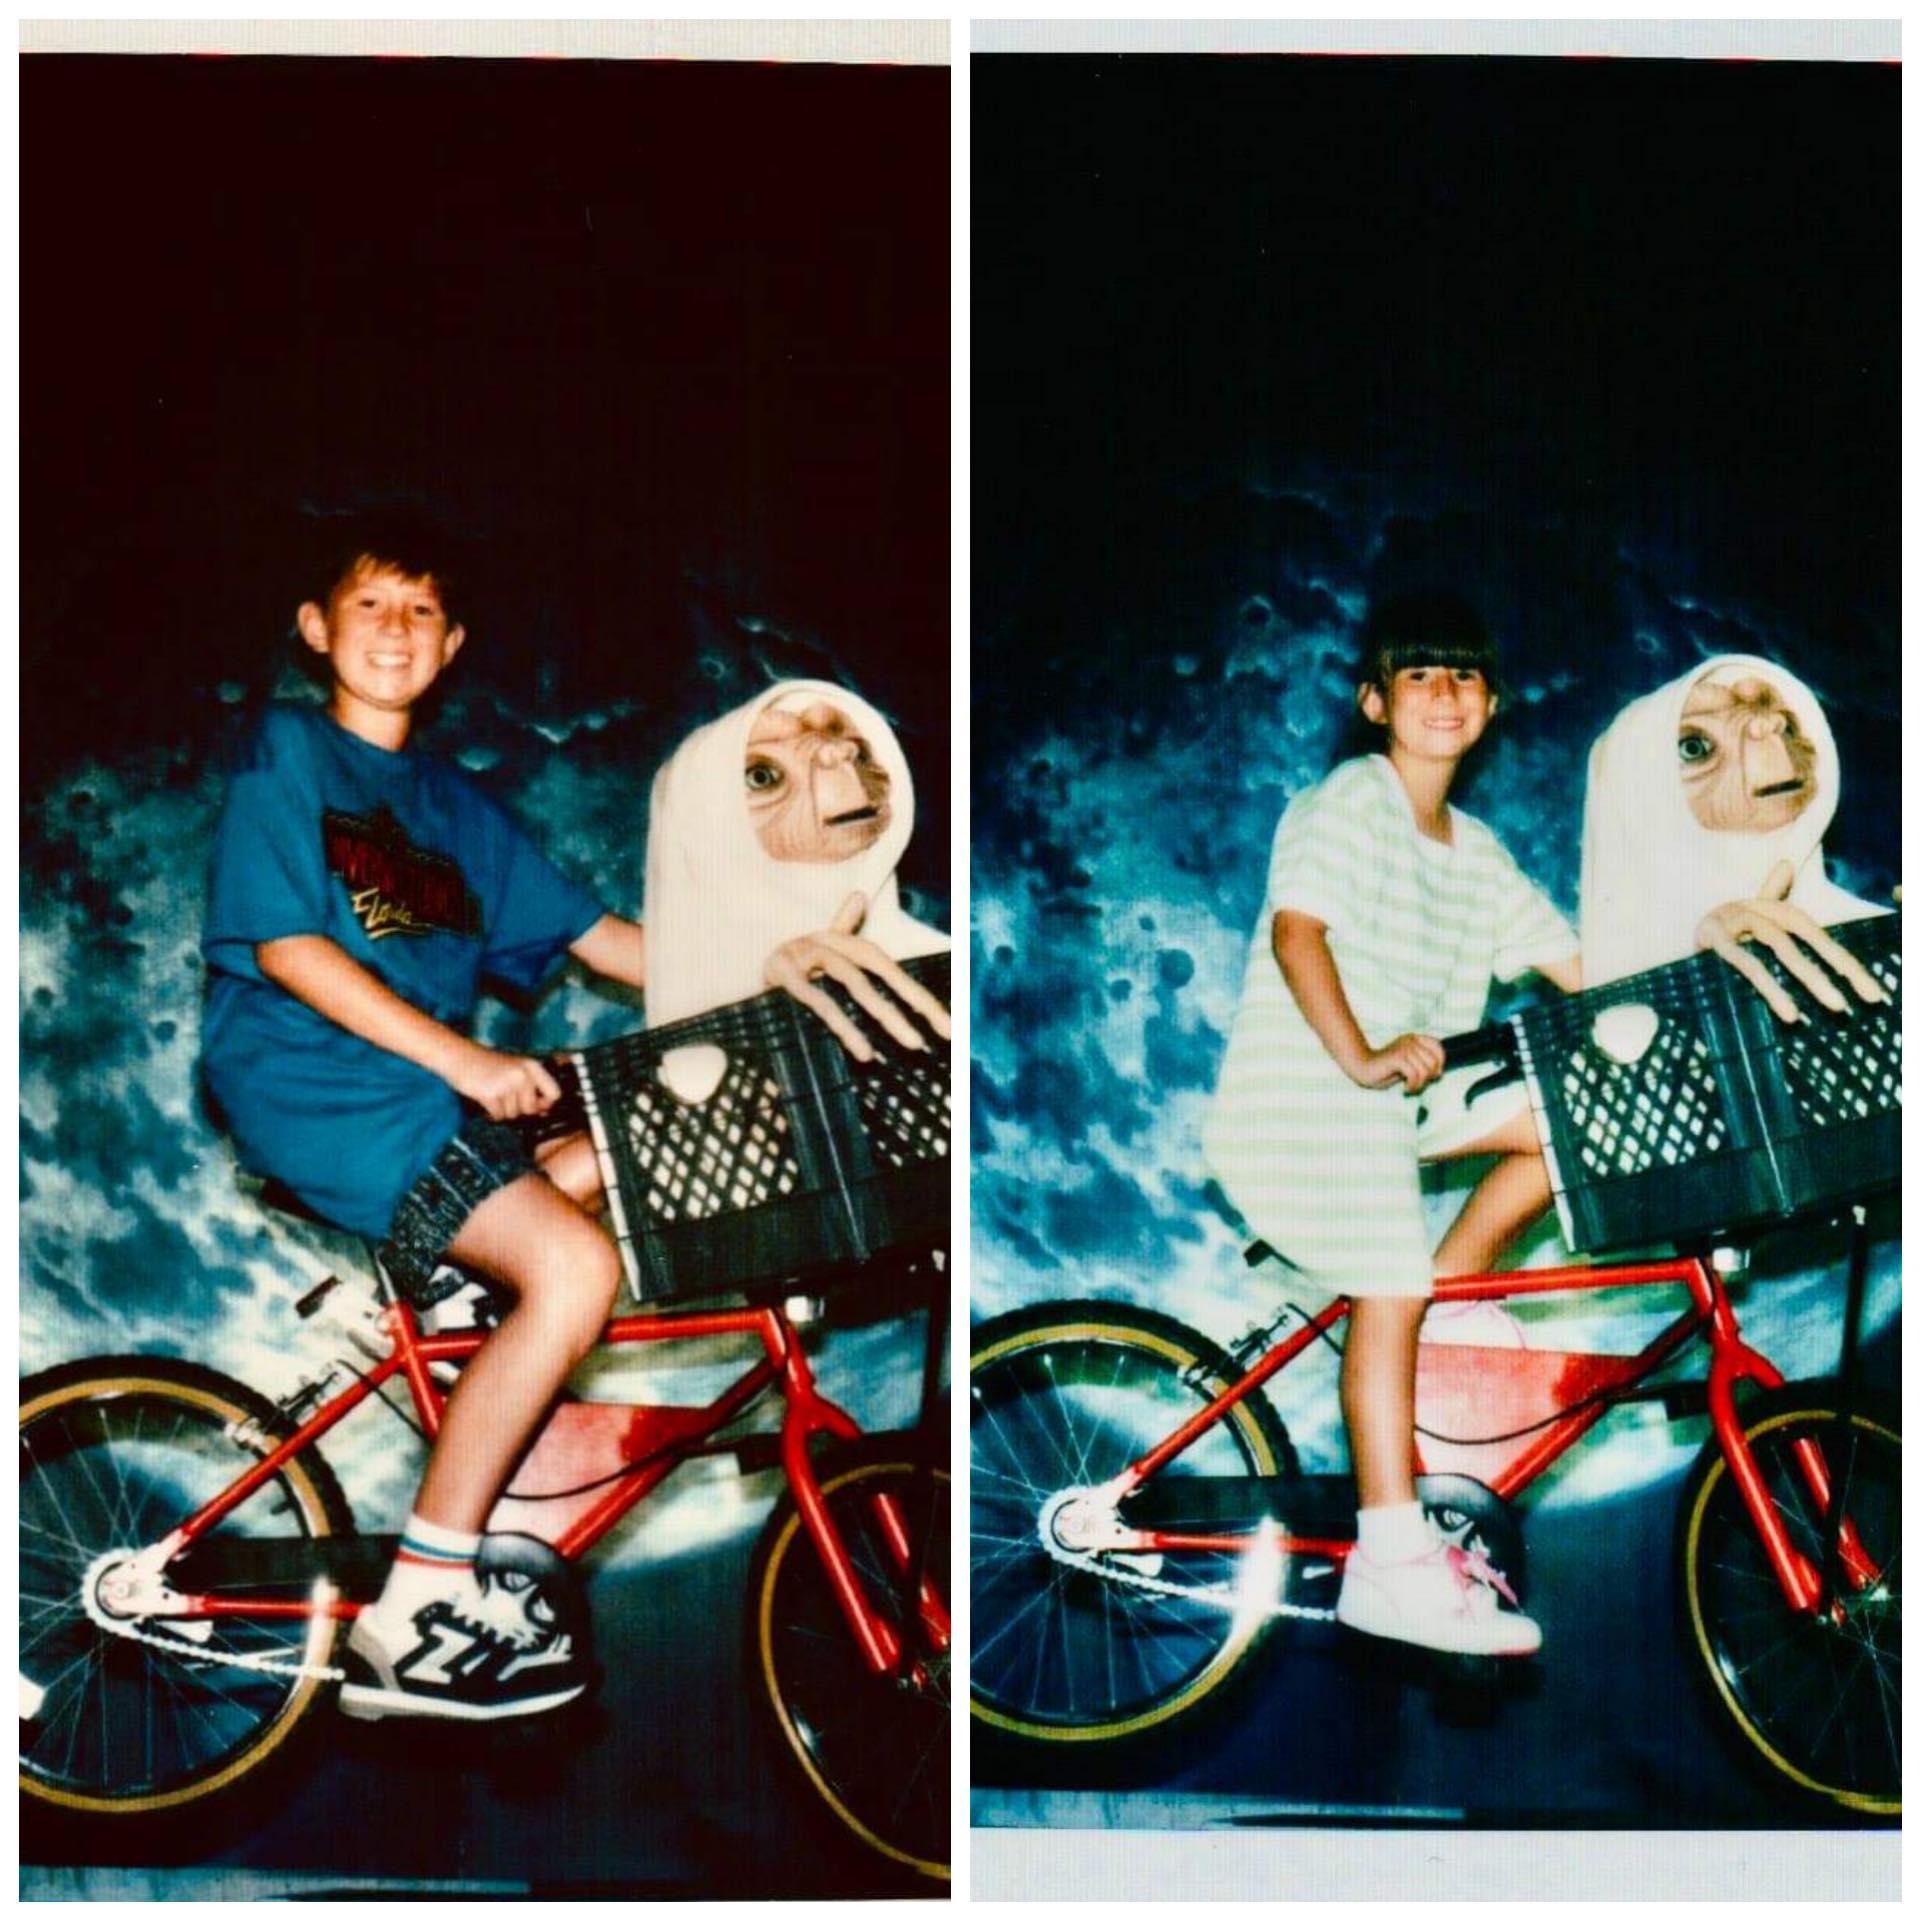 E.T. Adventure Ride Universal Studios Florida